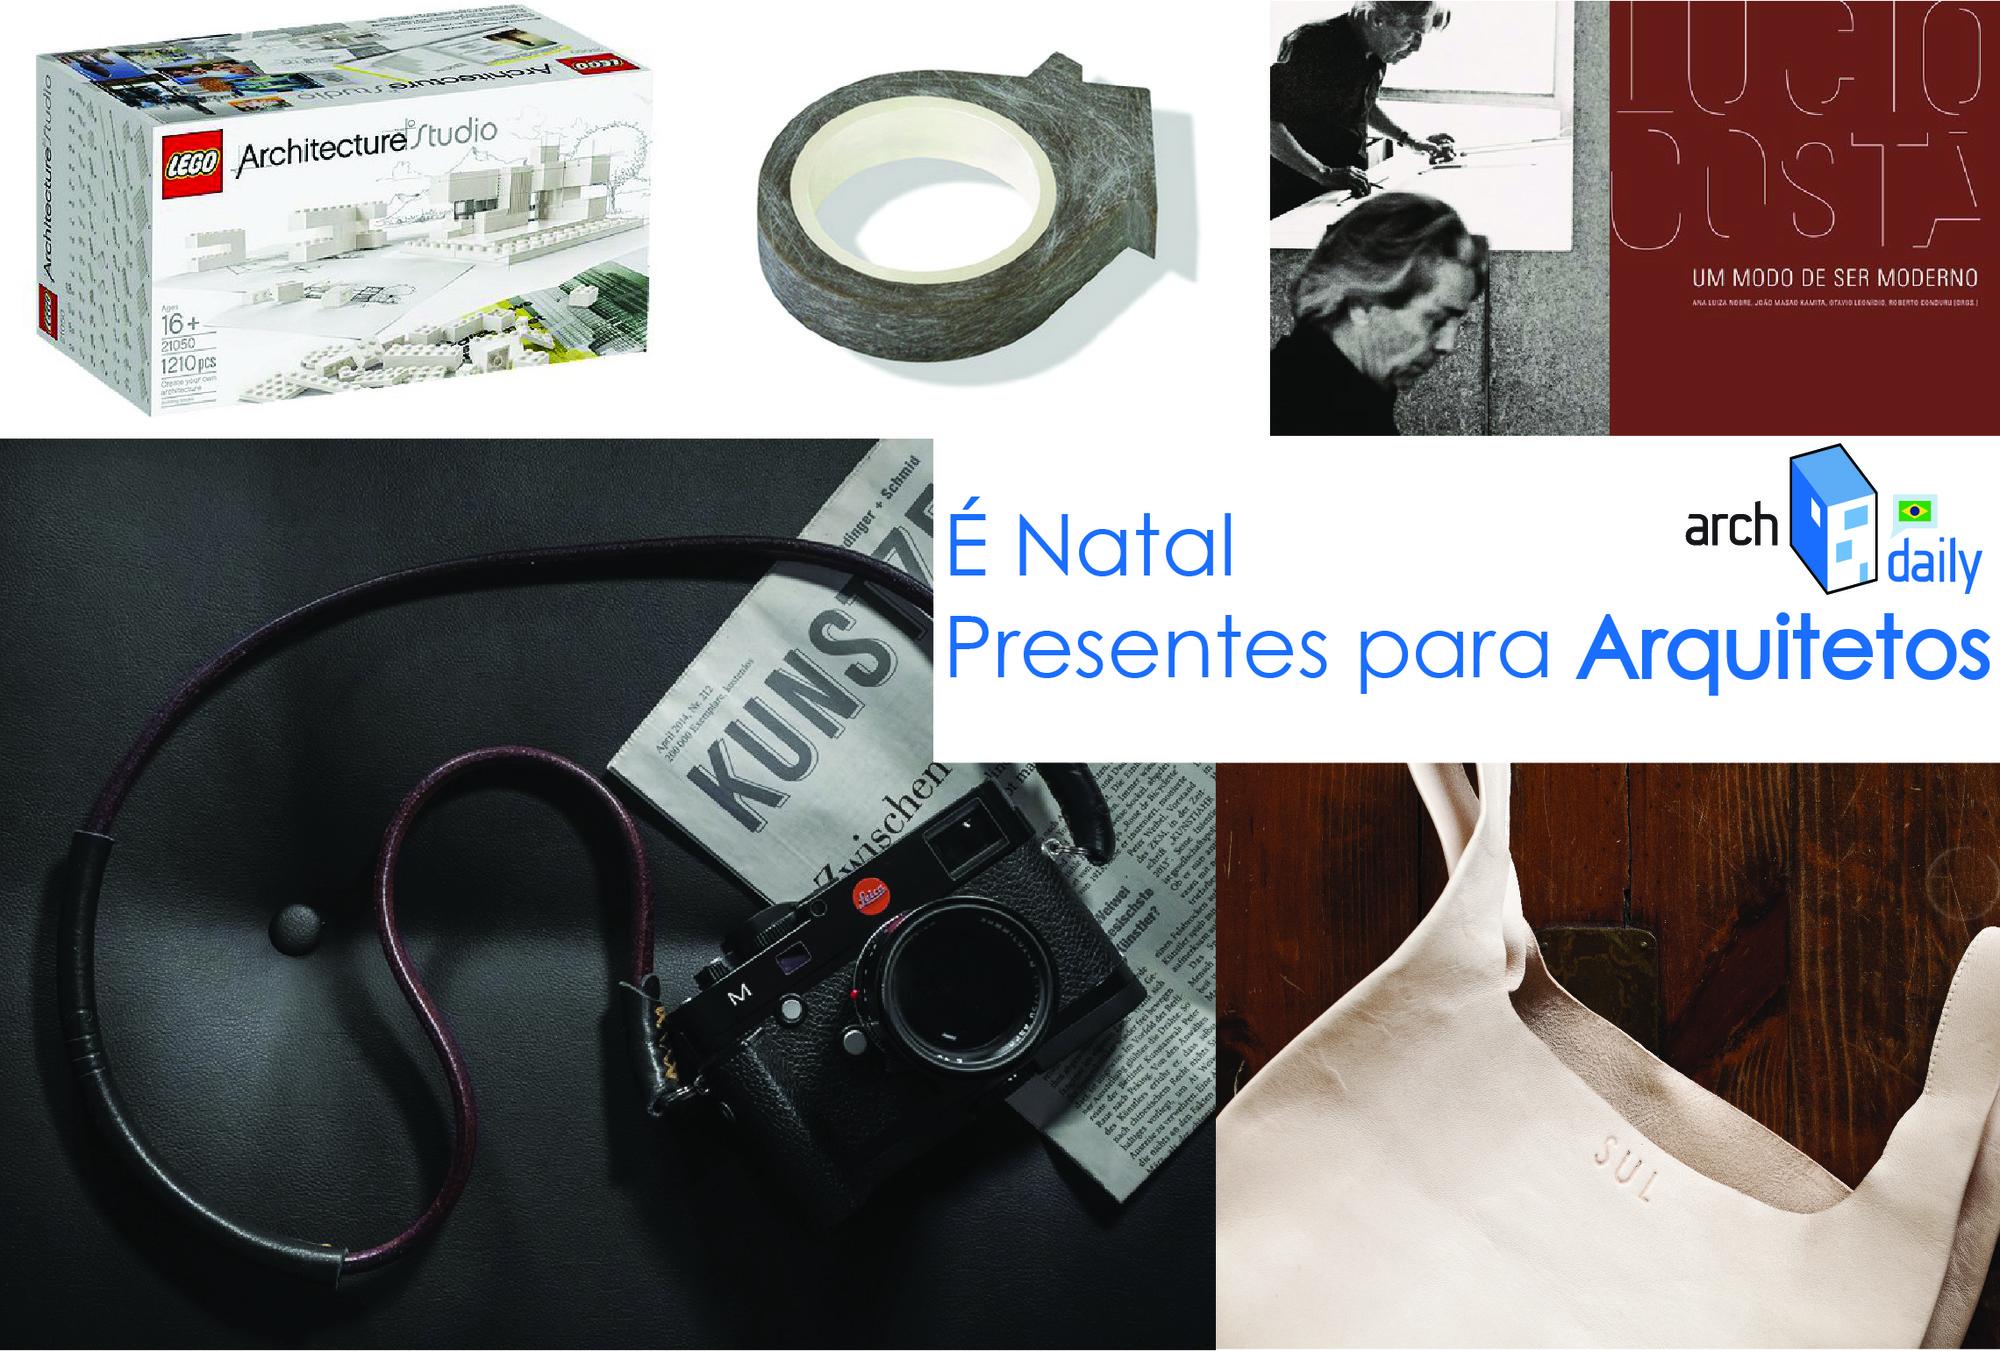 Lista de presentes de Natal para arquitetos, Pedro Vada. Image Cortesia de ArchDaily Brasil